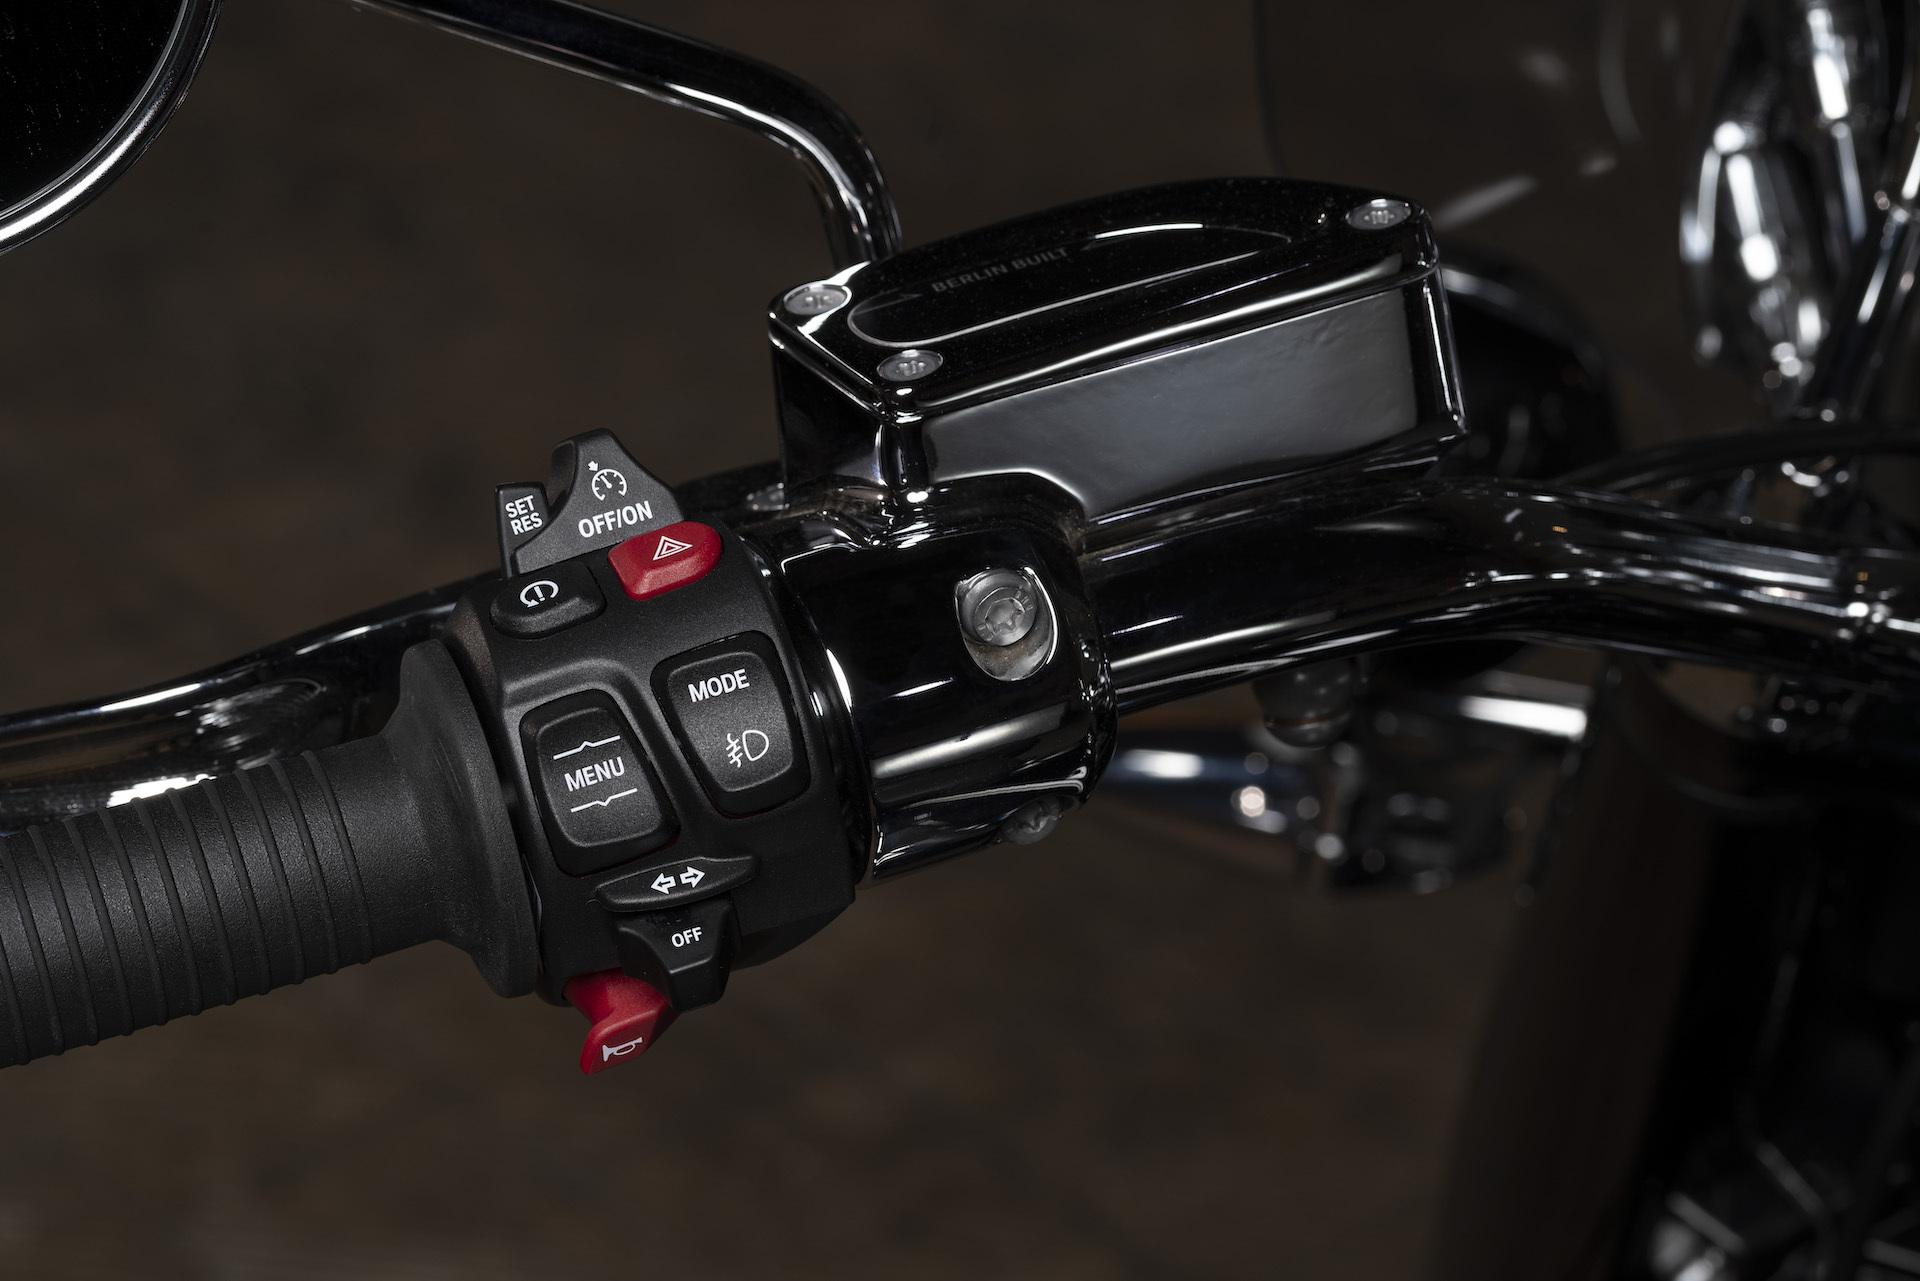 Moto Bmw R18 Classic Pina